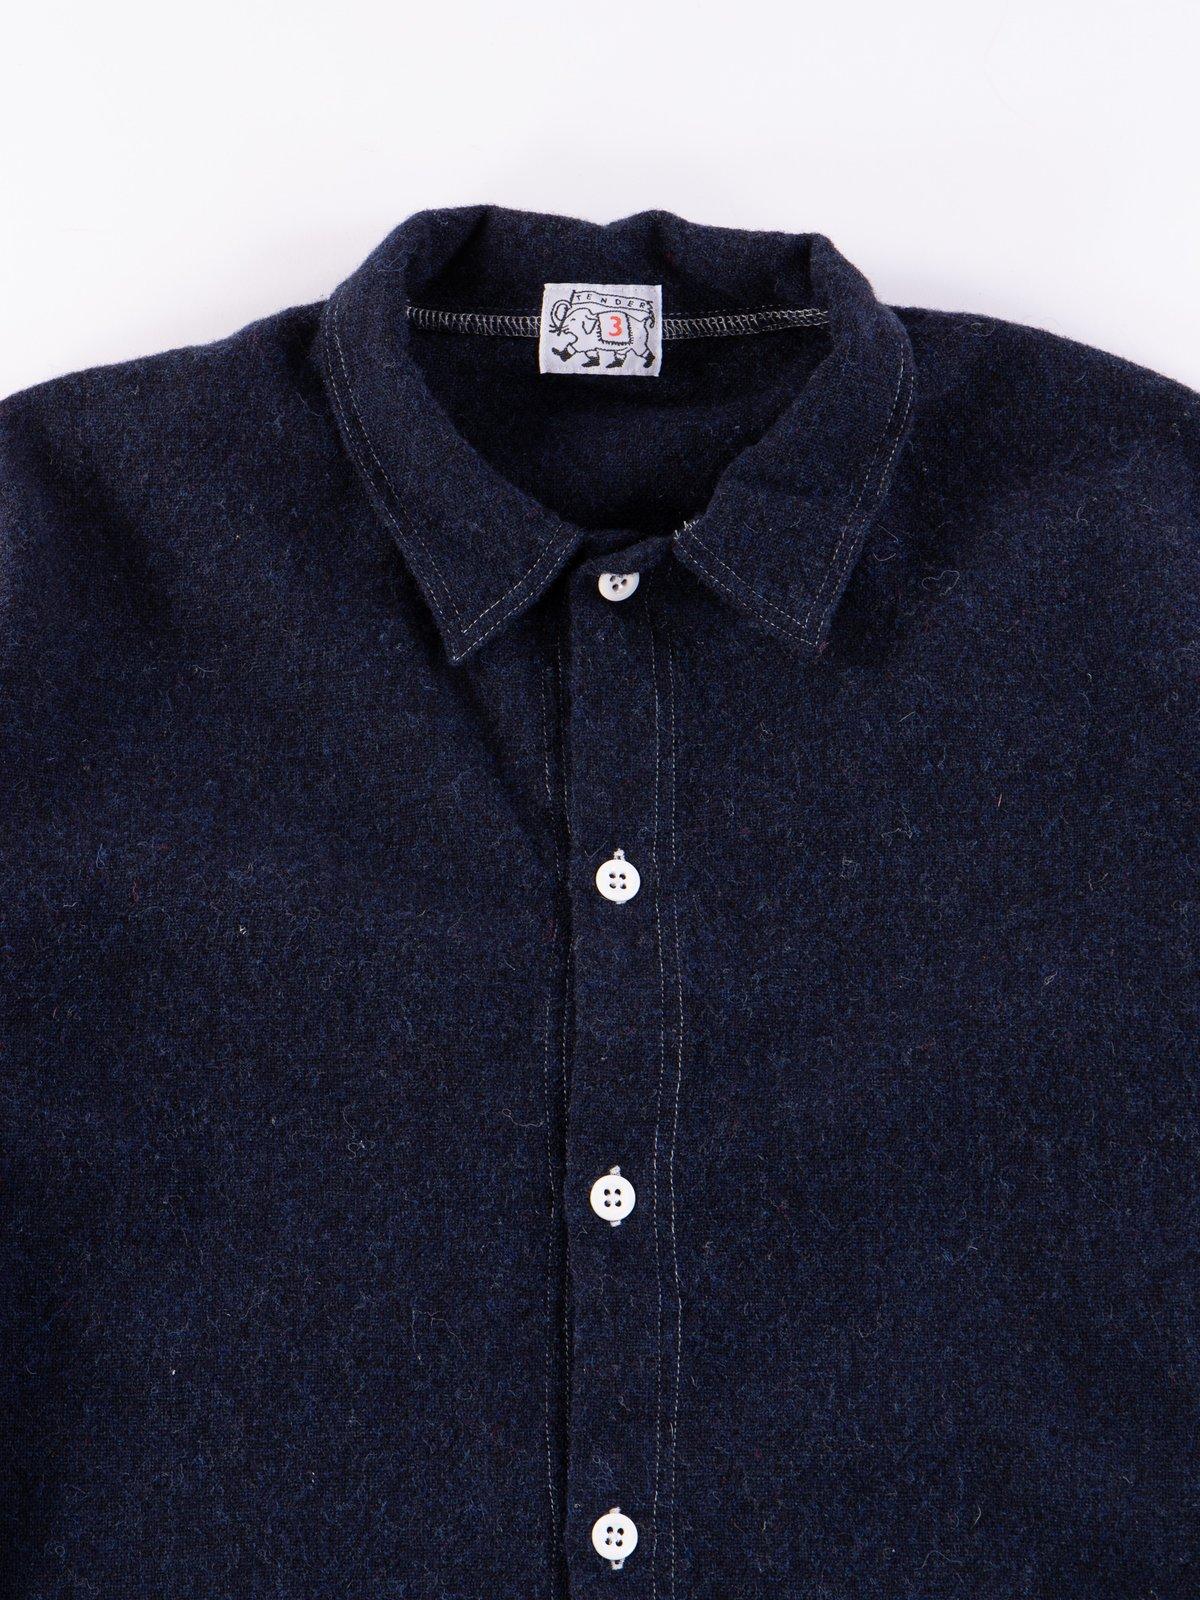 Navy Weavers Stock Tail Shirt - Image 3